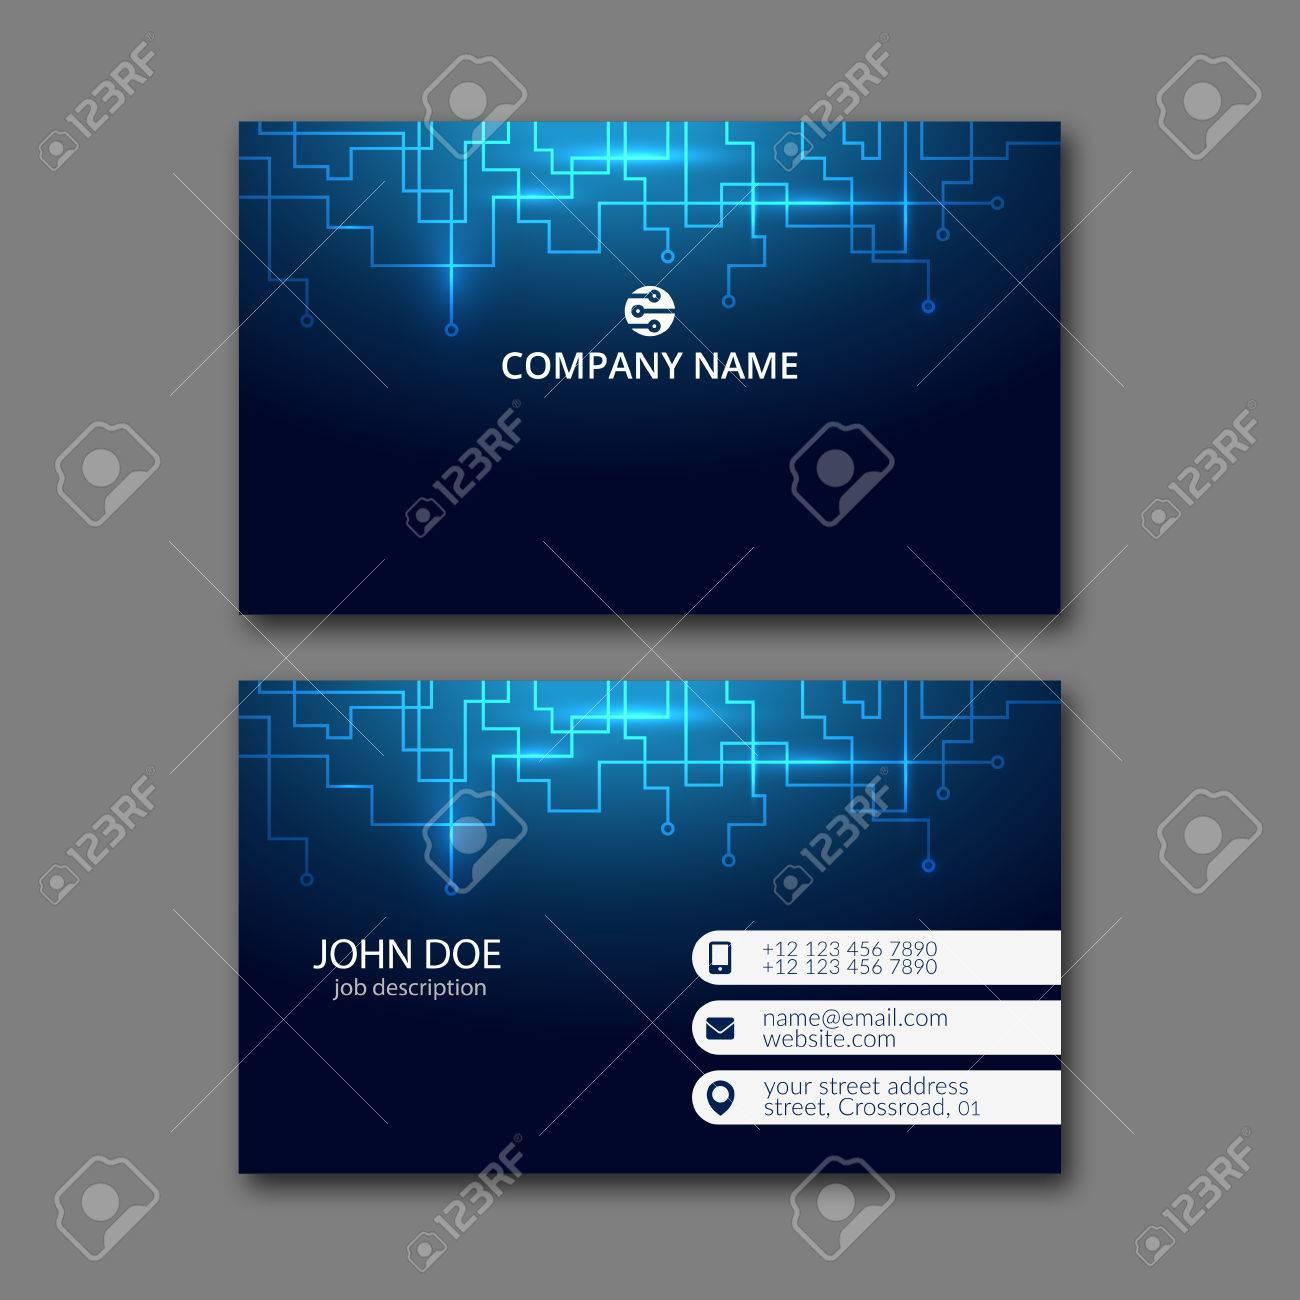 Elegant business card design template for creative design. - 67780553